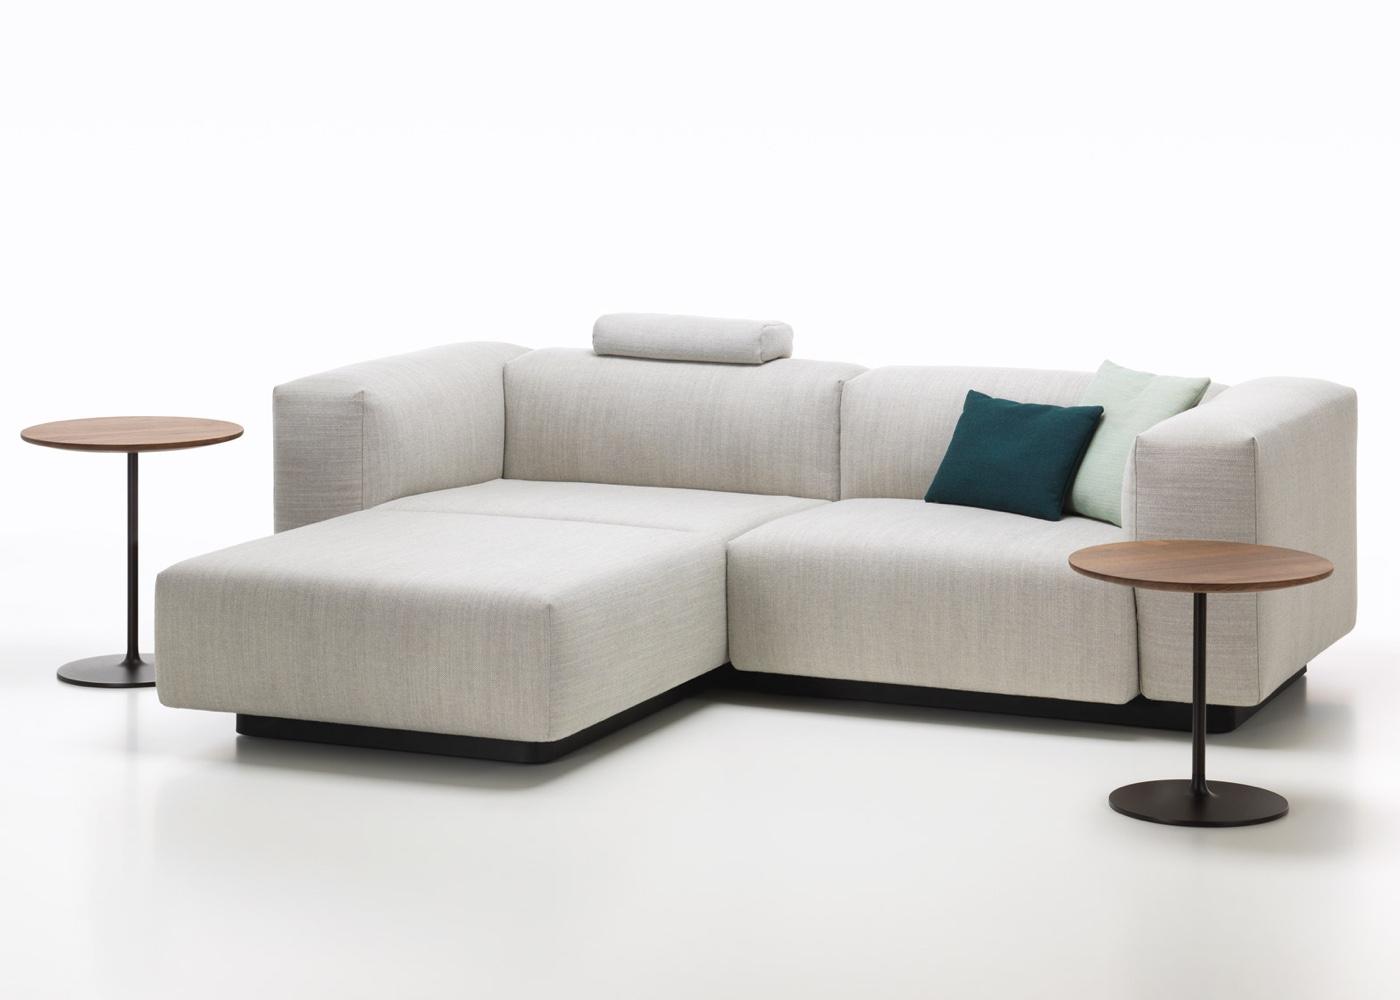 Soft Modular Sofa.Image via Dezeen.